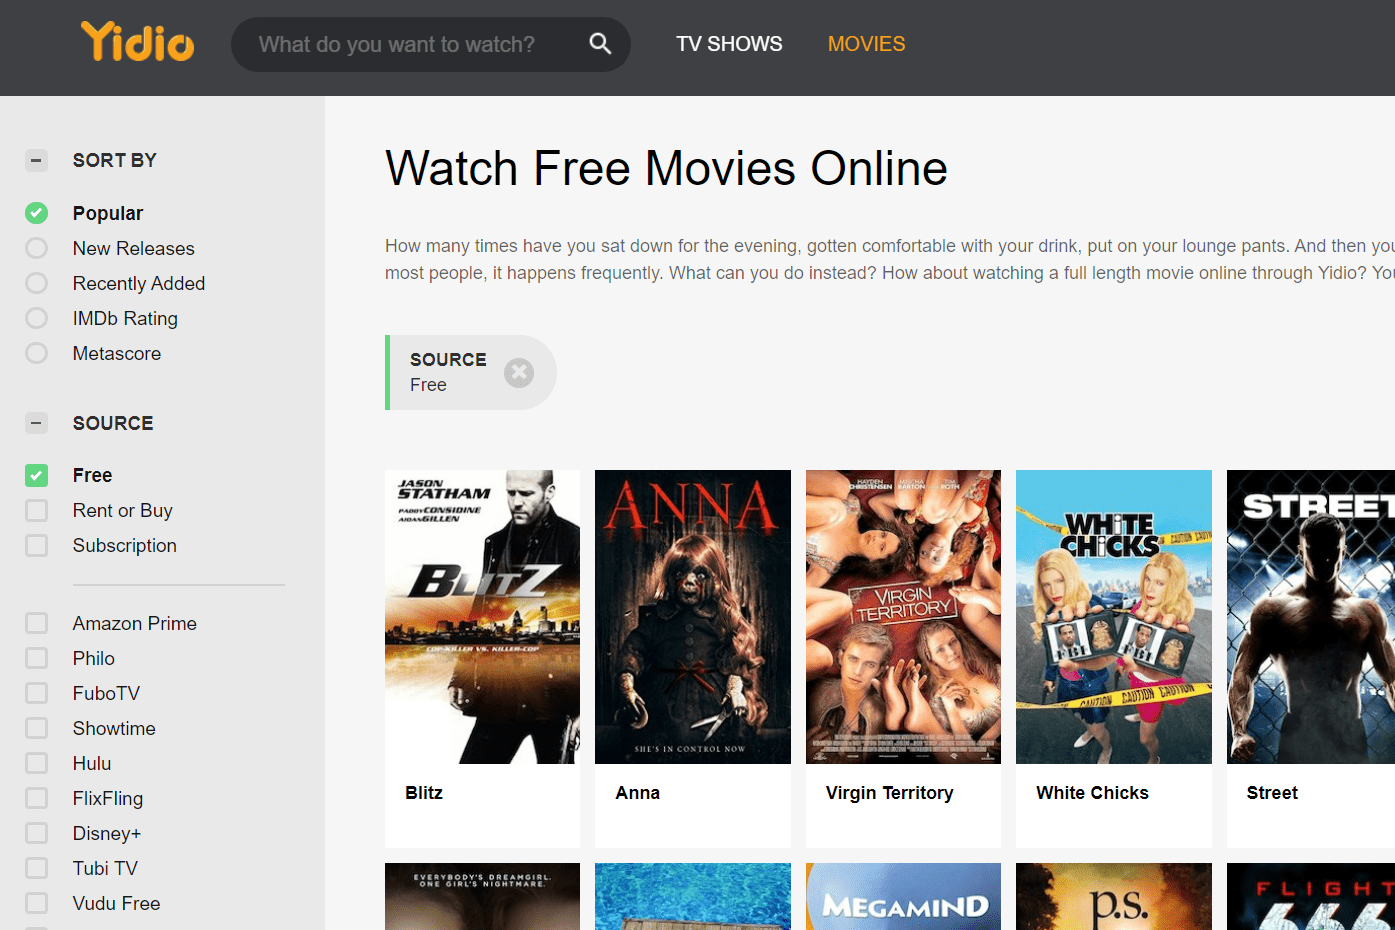 List of free movies at Yidio